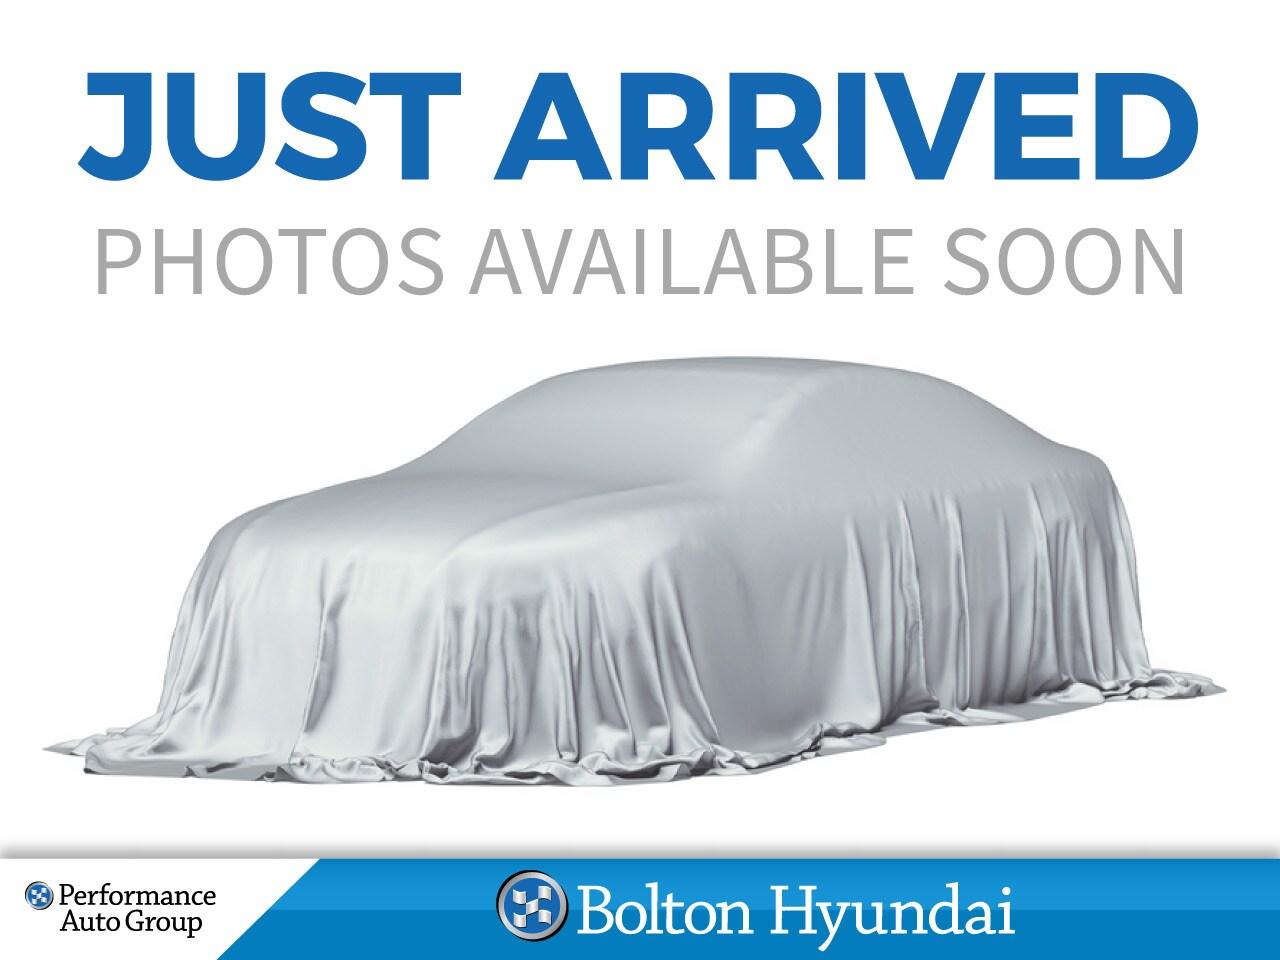 2014 Hyundai Santa Fe Sport 2.0T Limited Leather NAVI PanoRoof Winter Tire Pkg SUV